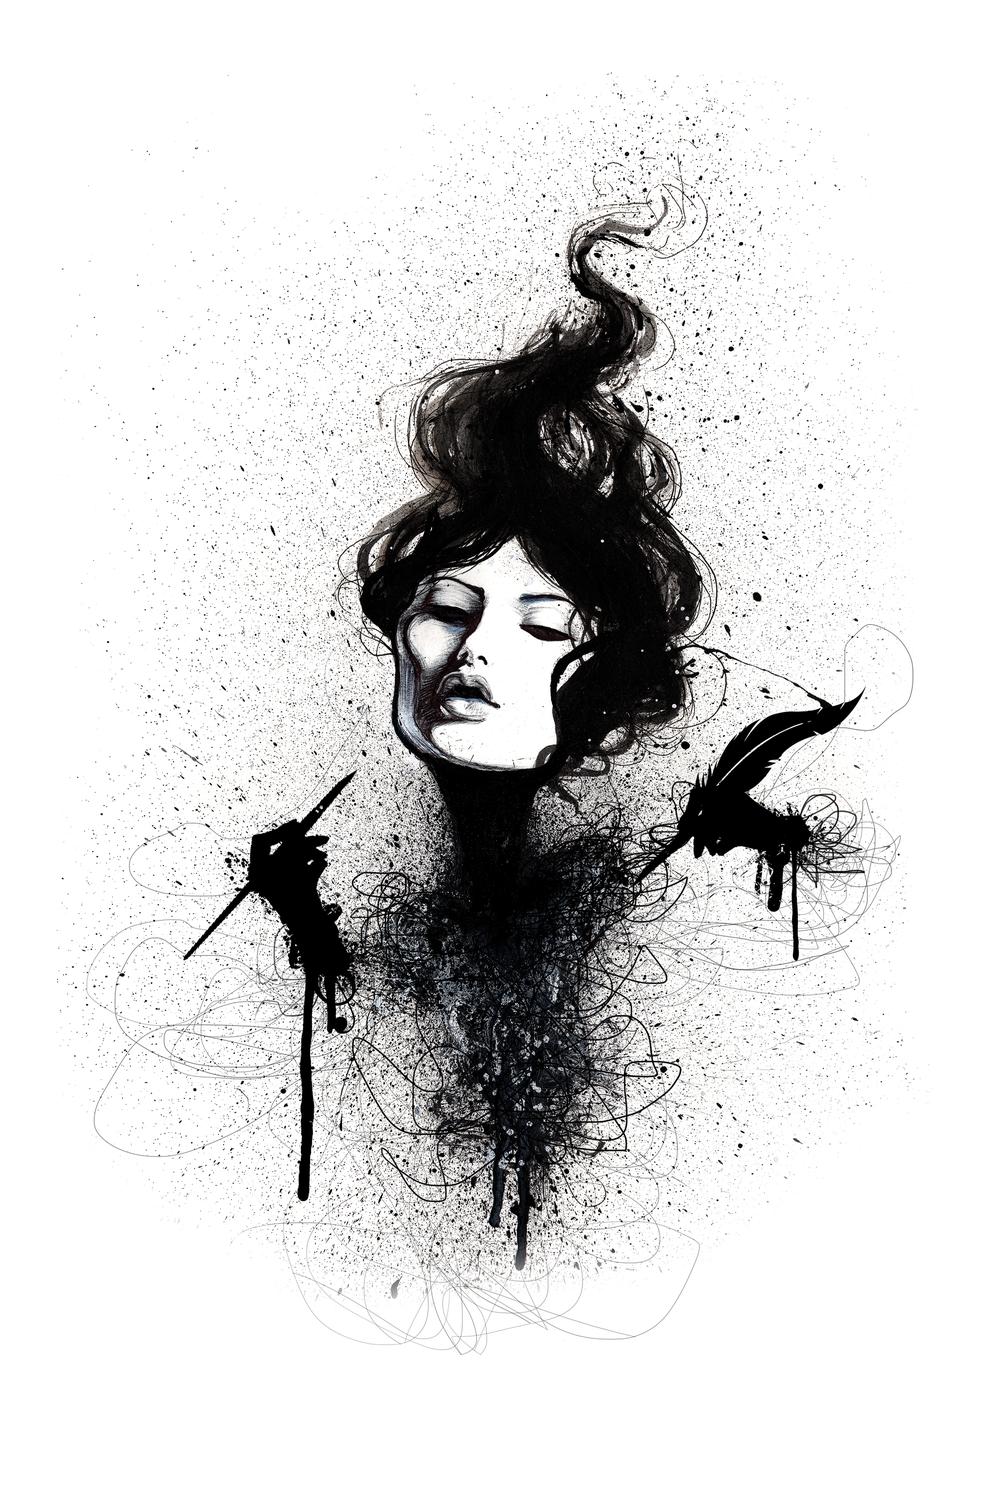 Image of Ink:Blood